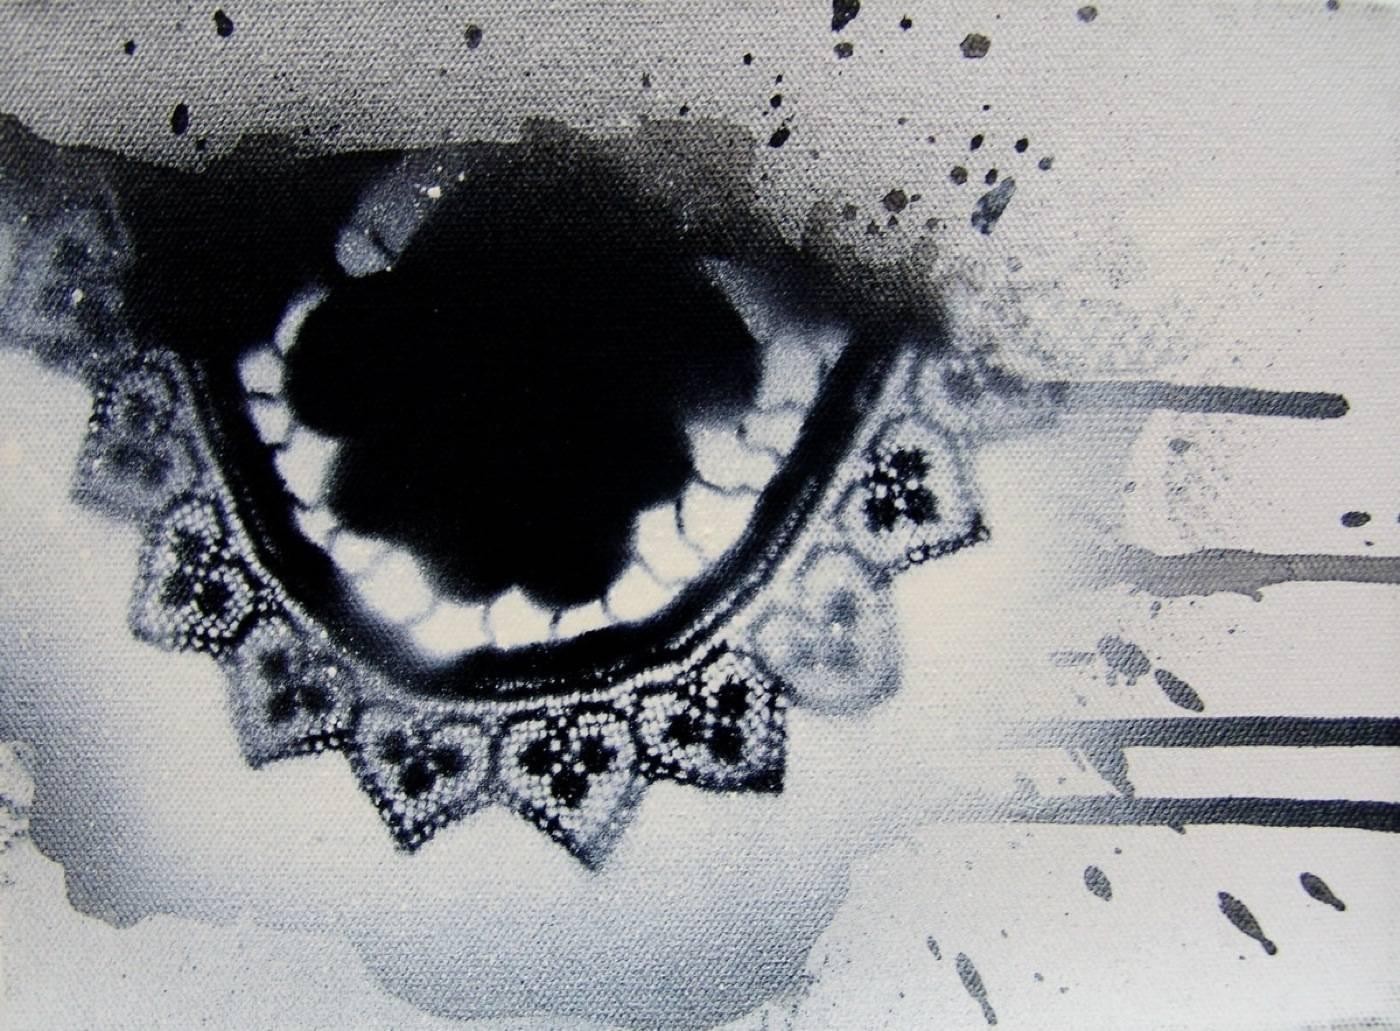 Lucia-Tallova-Hidden-grace-of-black-stories.jpg